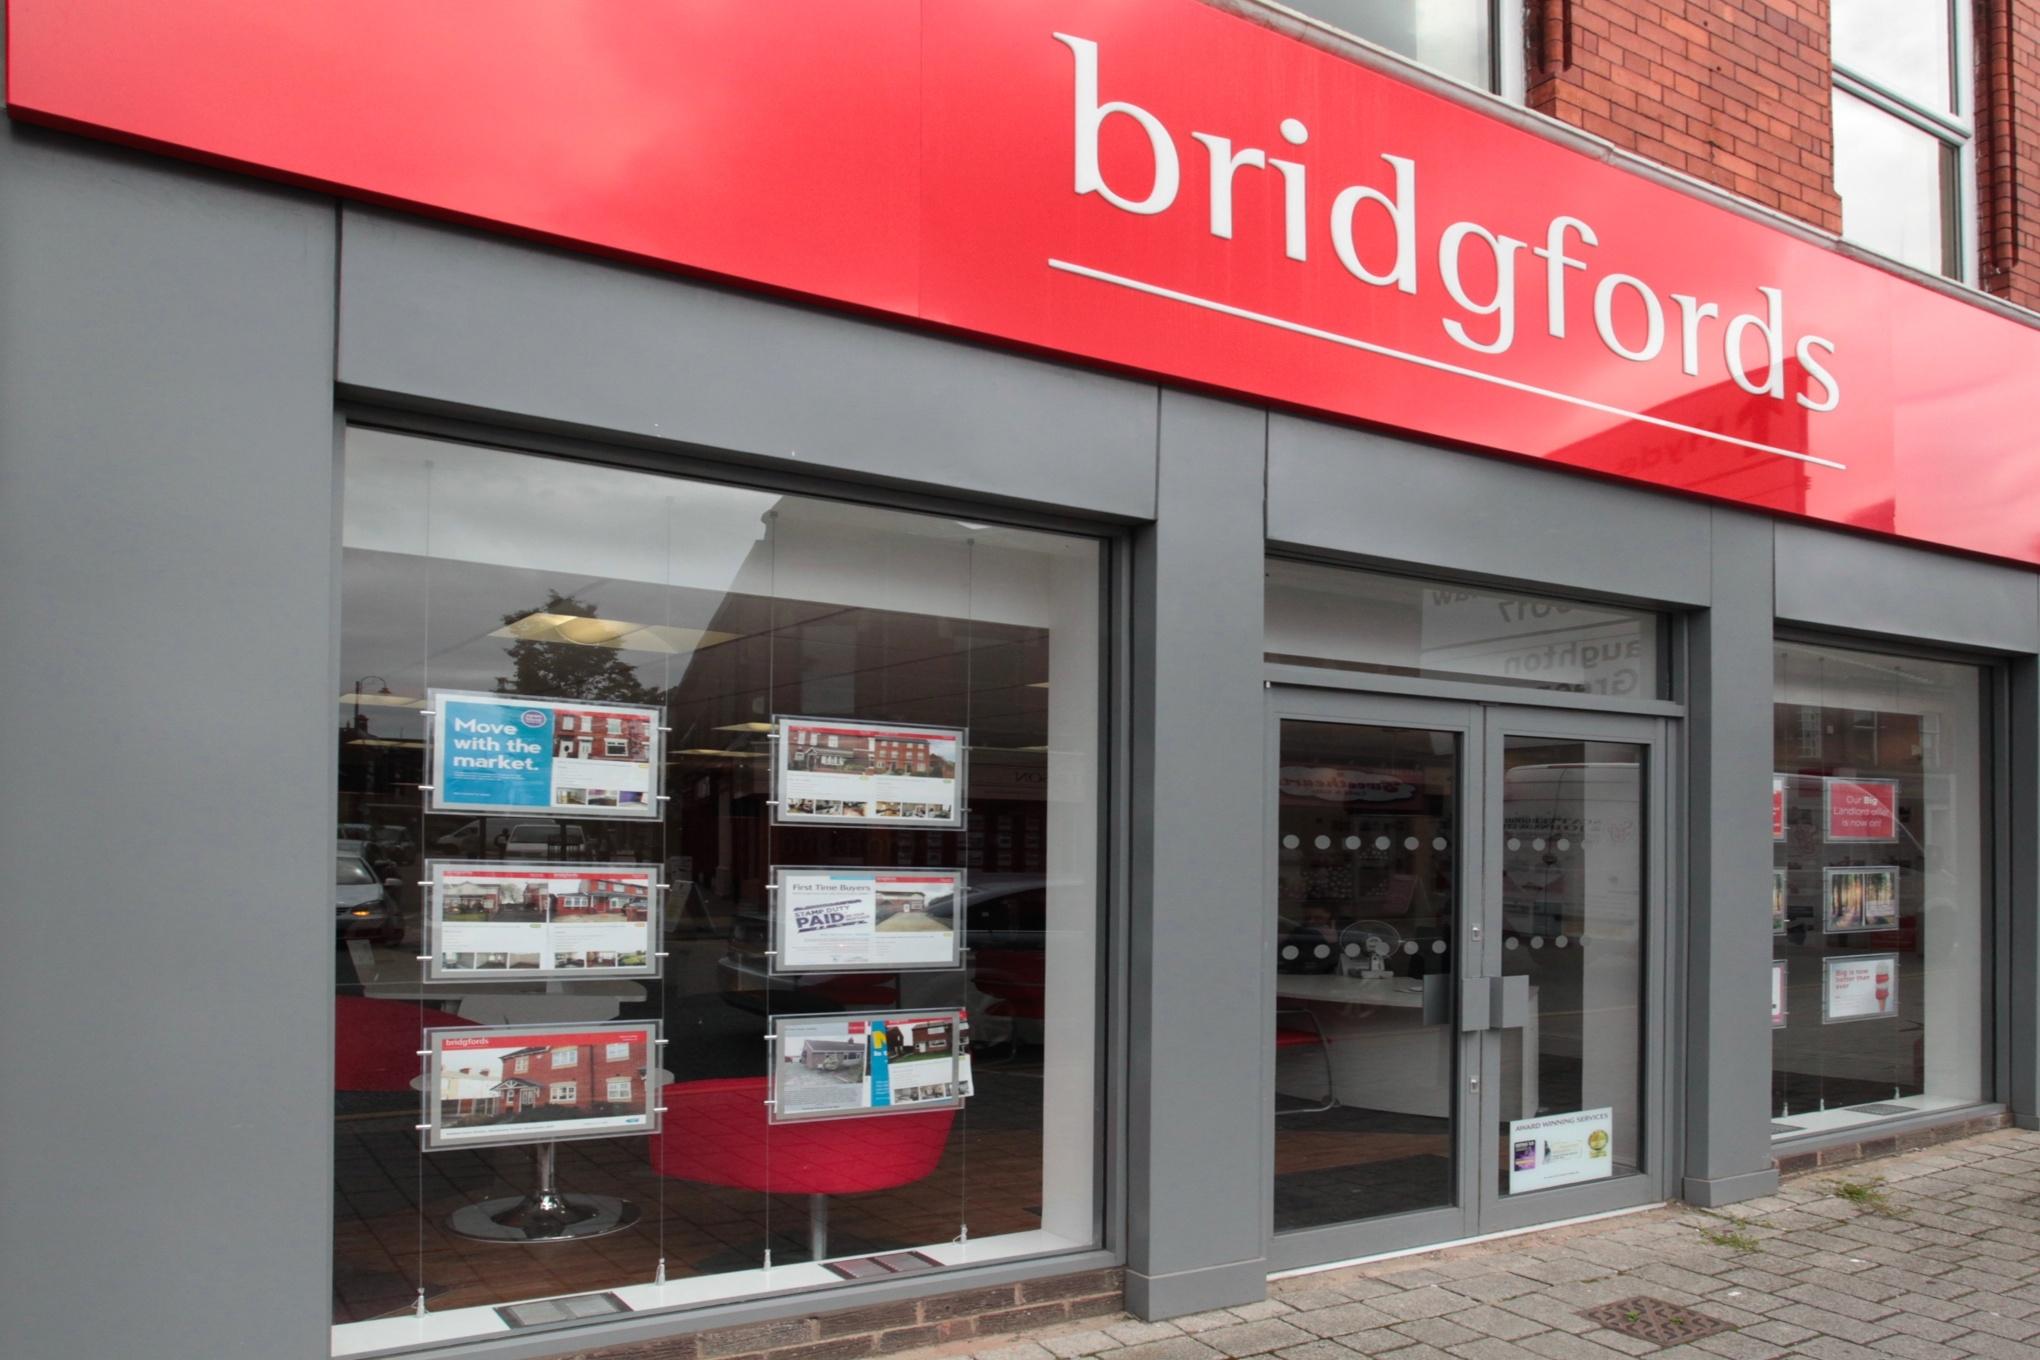 Bridgfords Estate Agents Denton